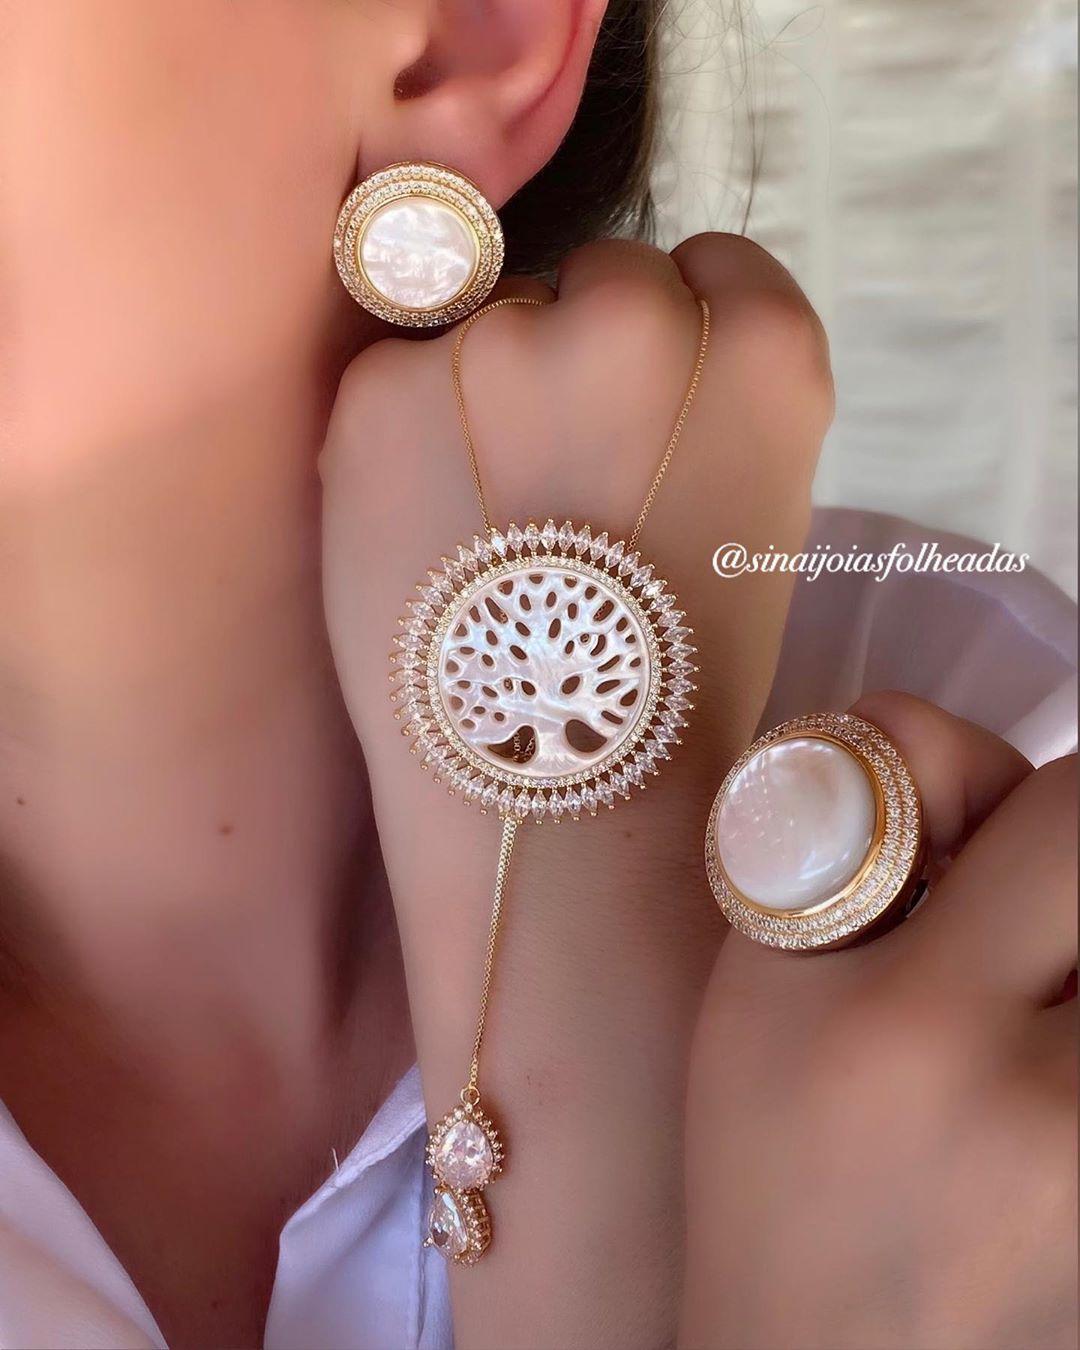 Lançamento 💎 Antecipe Suas Compras De N Semijoias - Jewelry